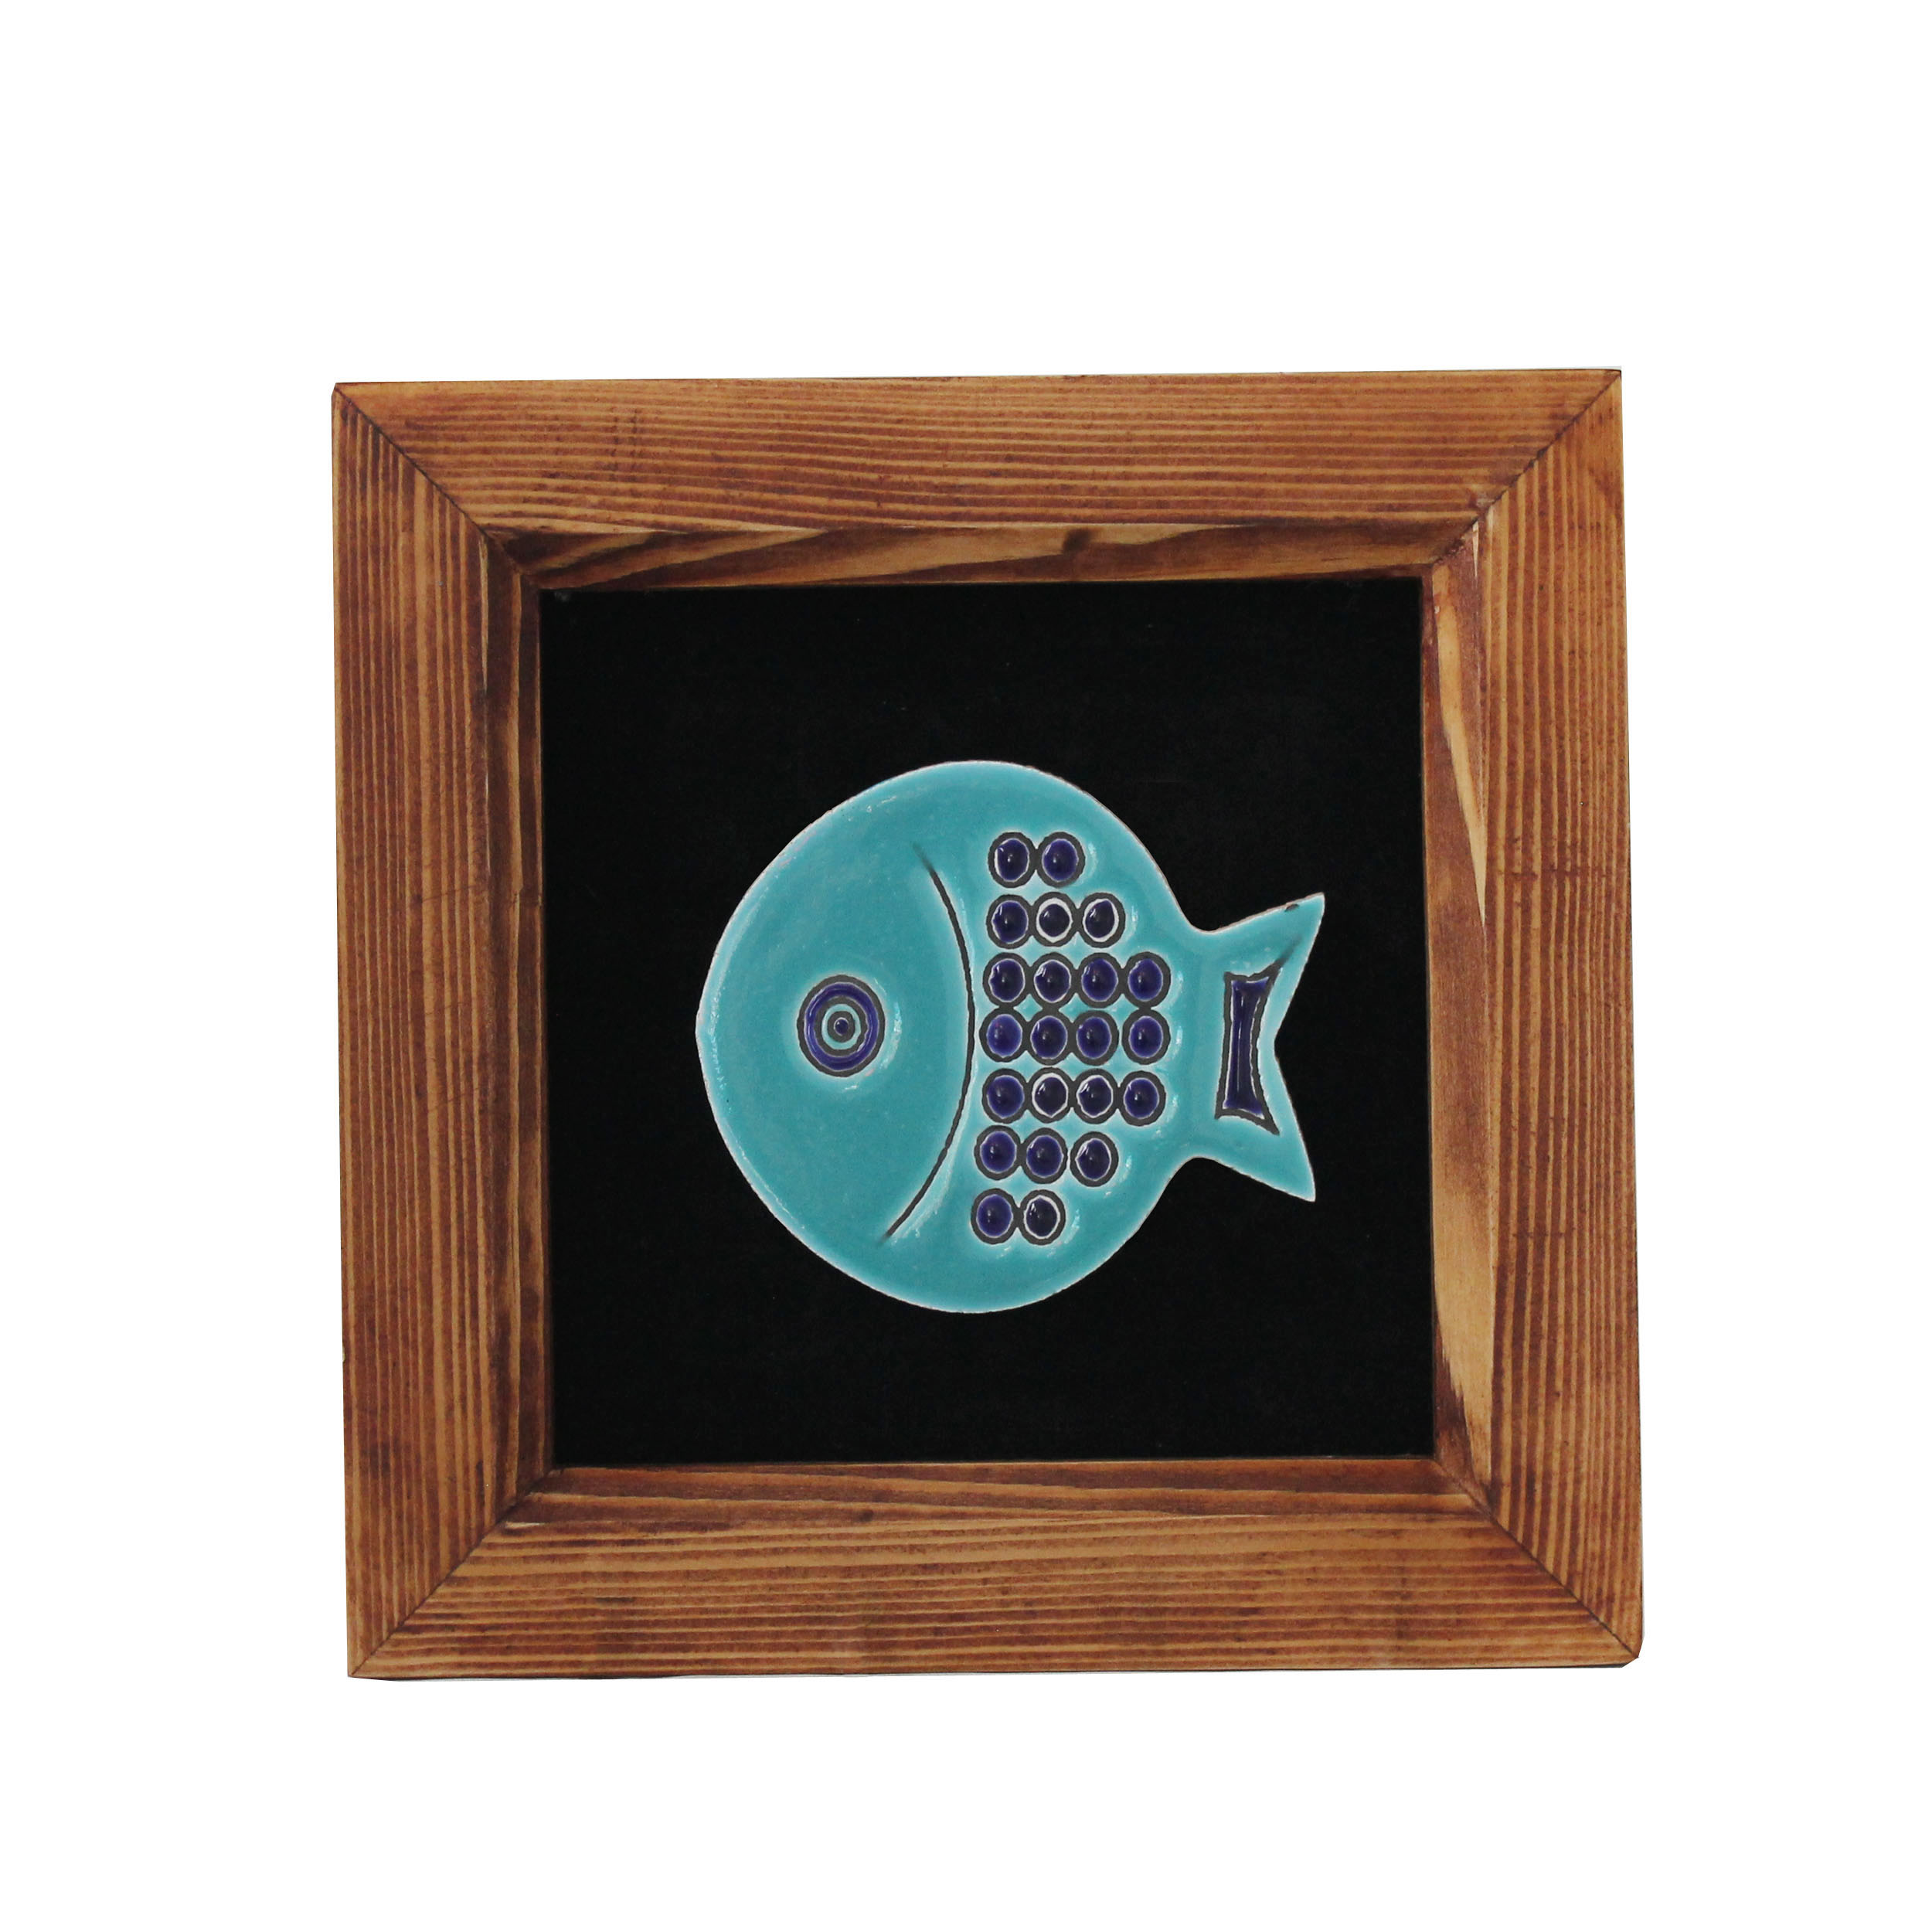 تابلو چوب و کاشی طرح ماهی